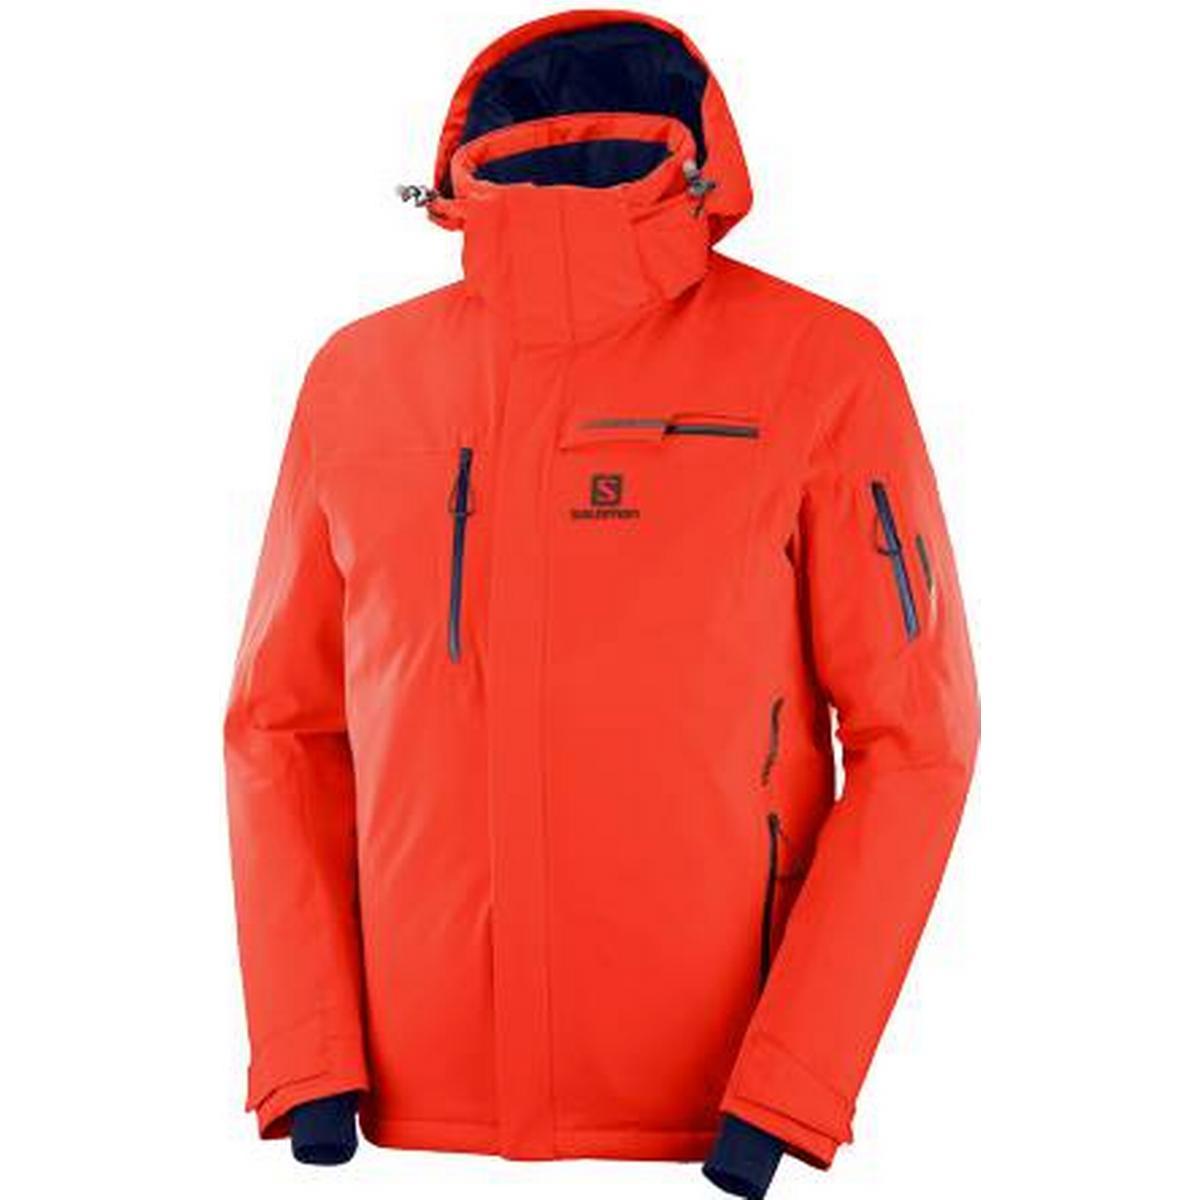 Skijakke Herre (700+ produkter) hos PriceRunner • Se